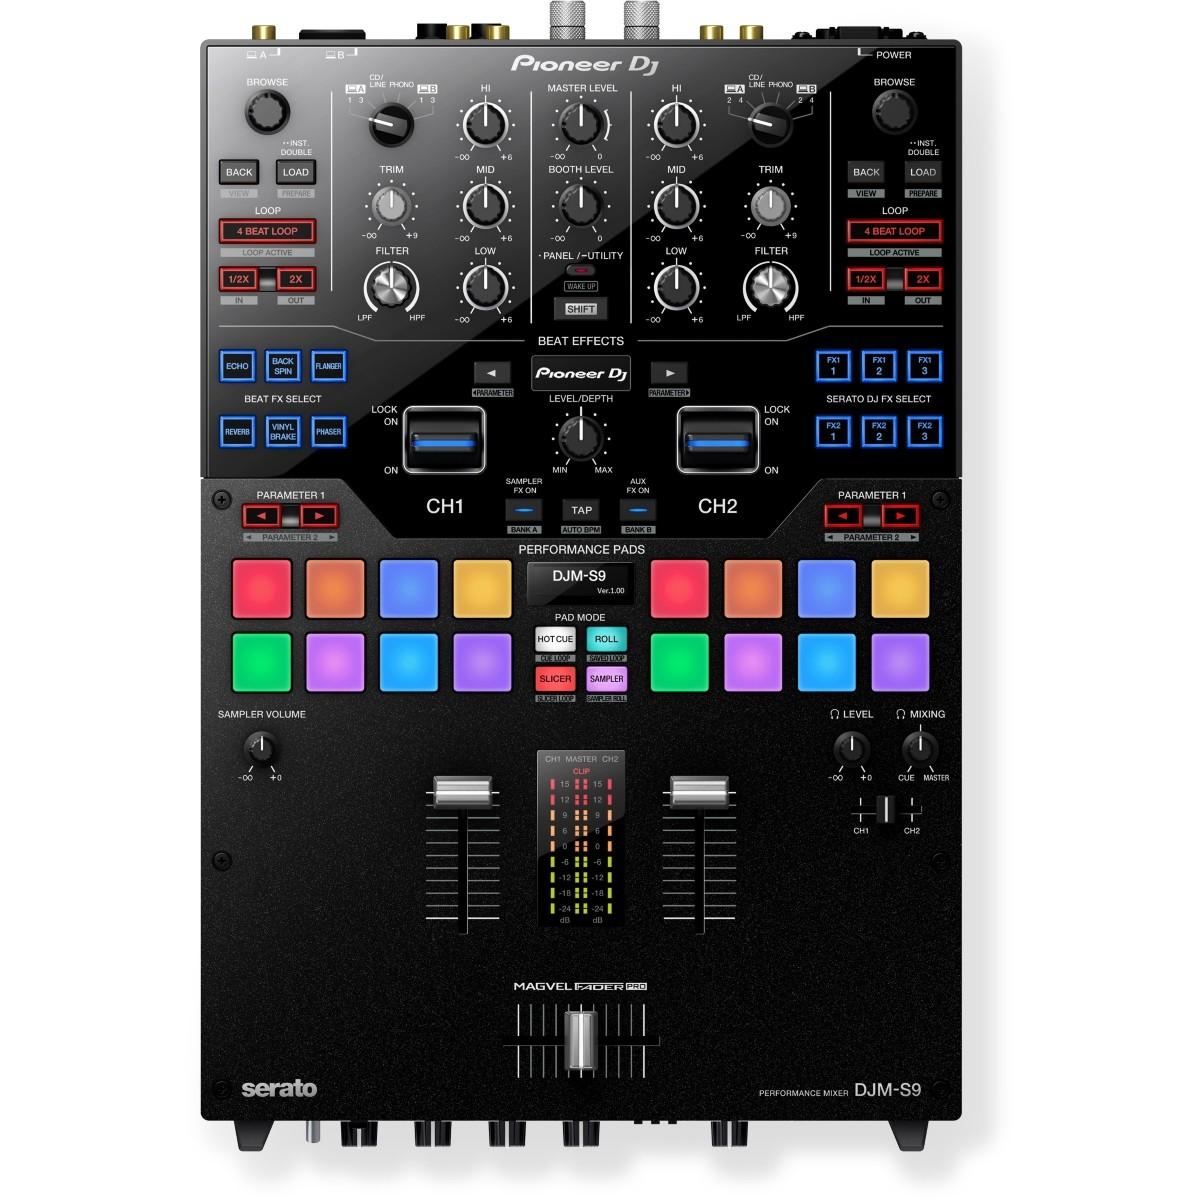 MIXER PIONEER DJM-S9 ricond